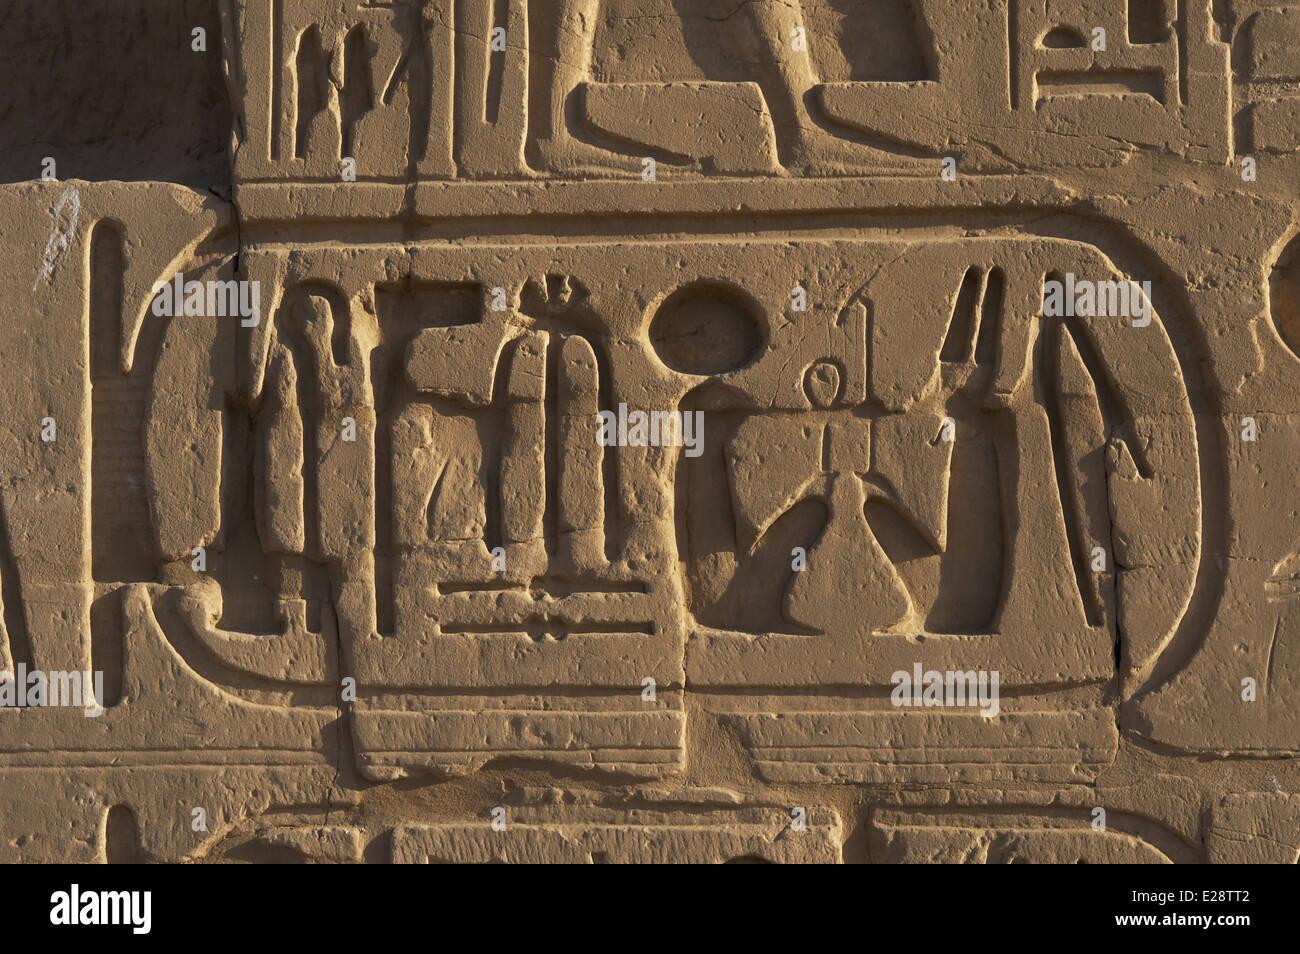 Egypt. The Karnak Temple Complex. Hieroglyphic writing. Royal protocol of Ramesses VI Nebmaatre-Meryamun. - Stock Image